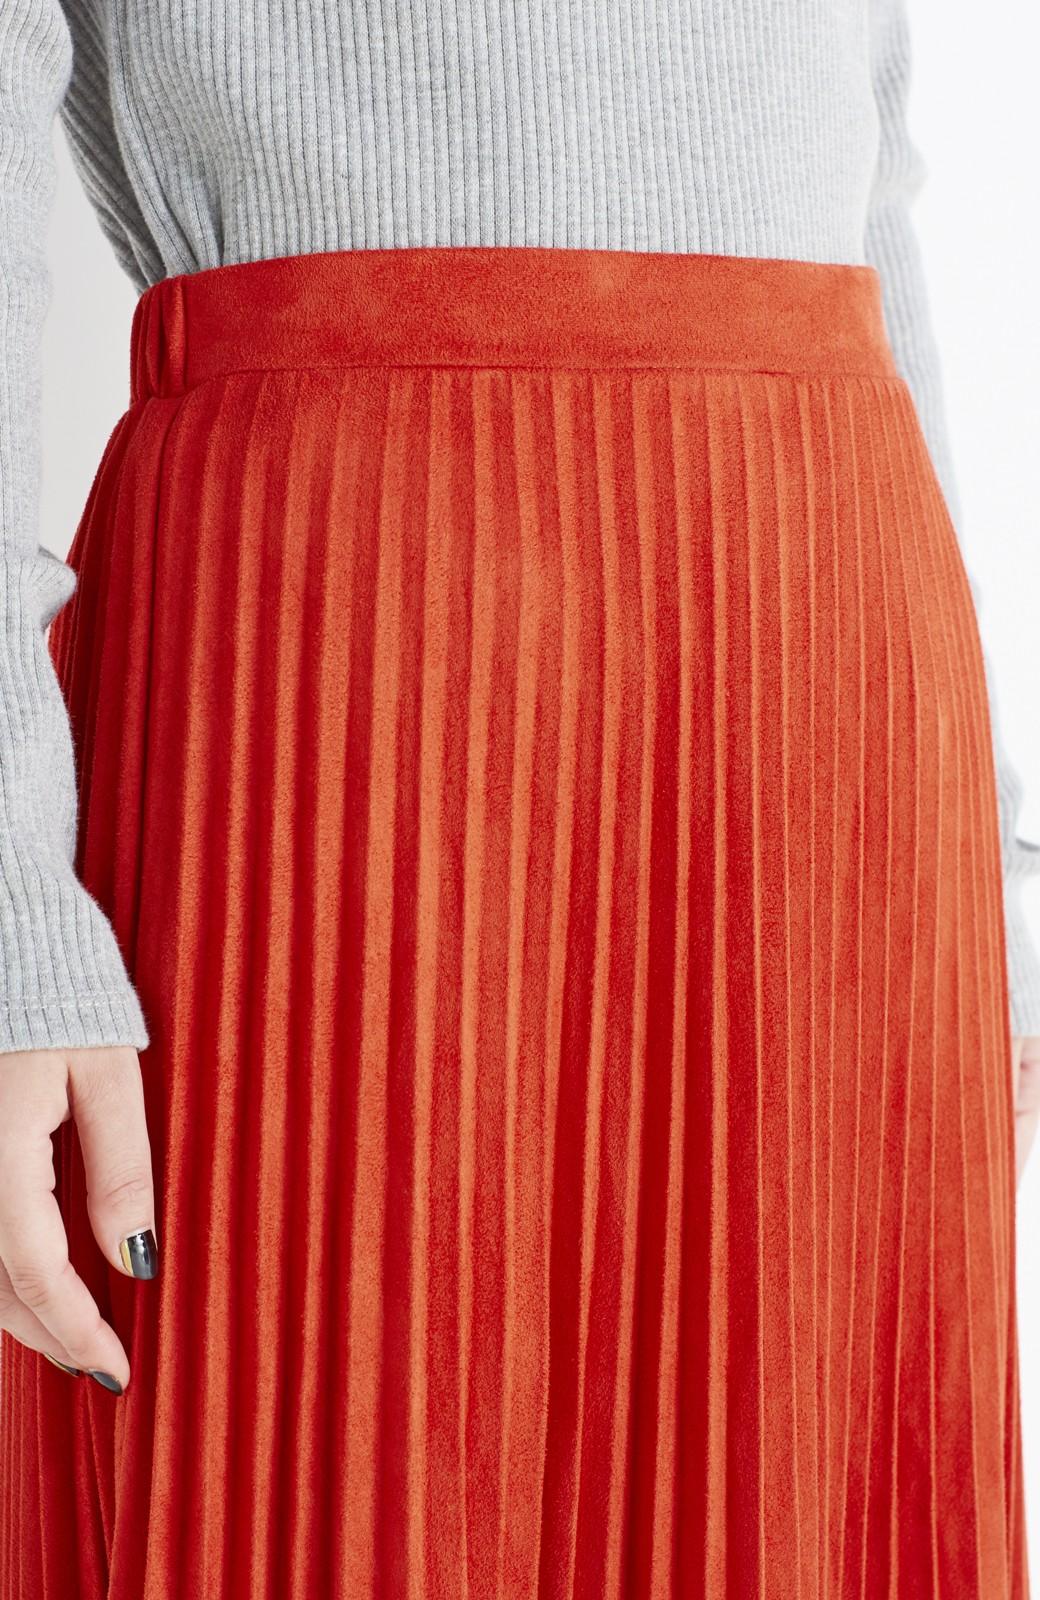 haco! 楽して女っぽい フェイクスエードのプリーツスカート  by que made me <オレンジ系その他>の商品写真10